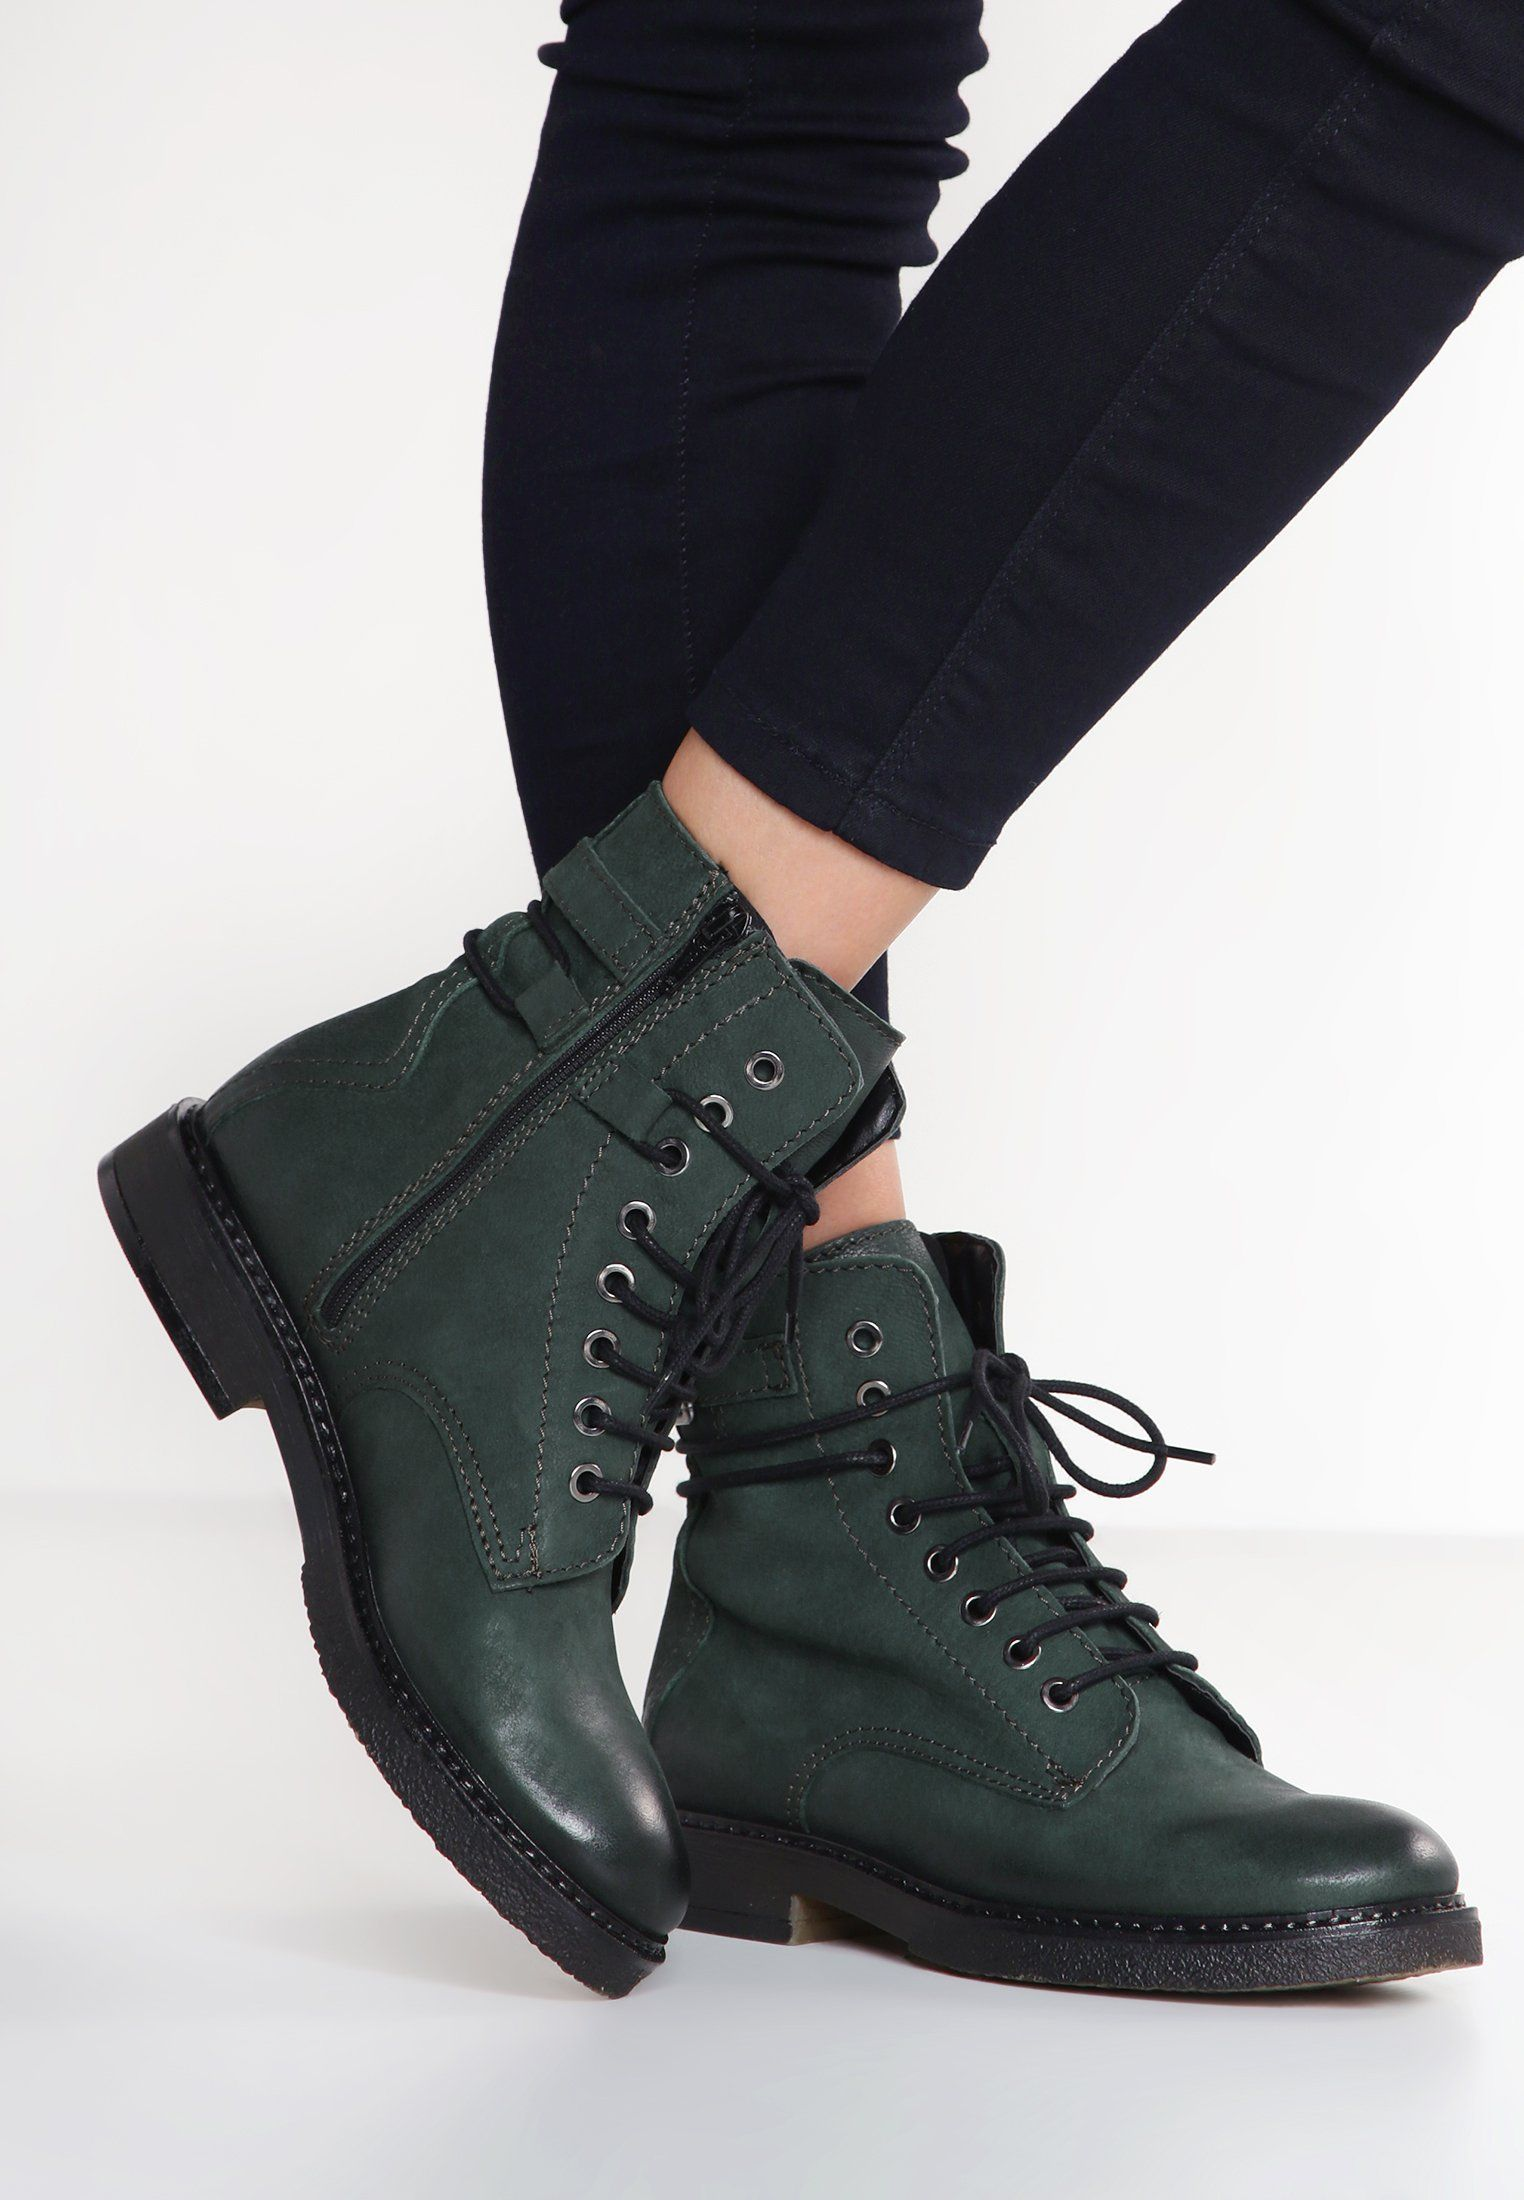 Tamaris Boots | Boots, Shoes, Combat boots